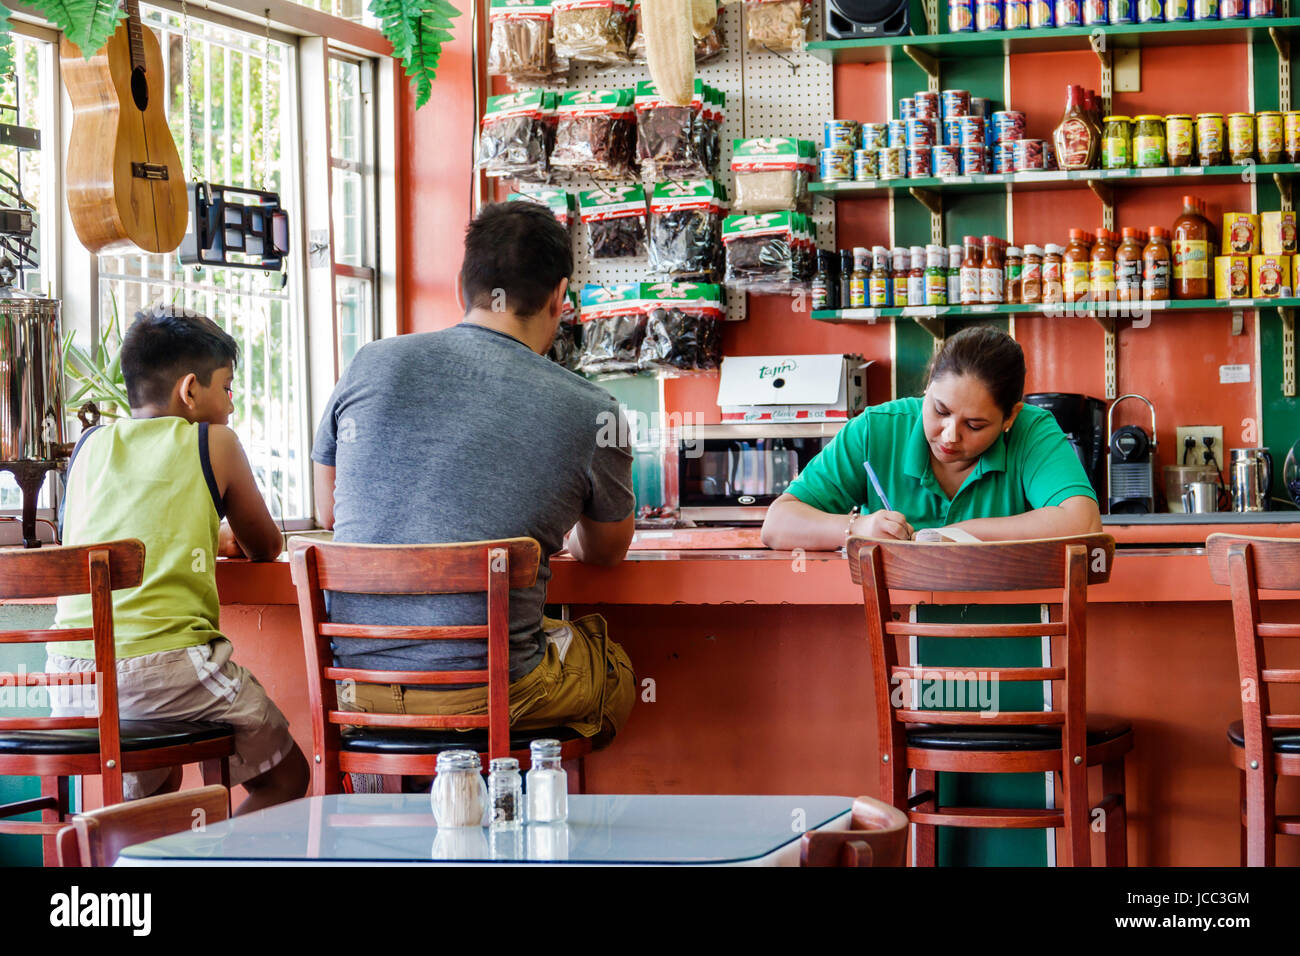 Quartier Little Havana Miami Florida Taqueria El Mexicano restaurant restaurants mexicains de produits alimentaires Photo Stock